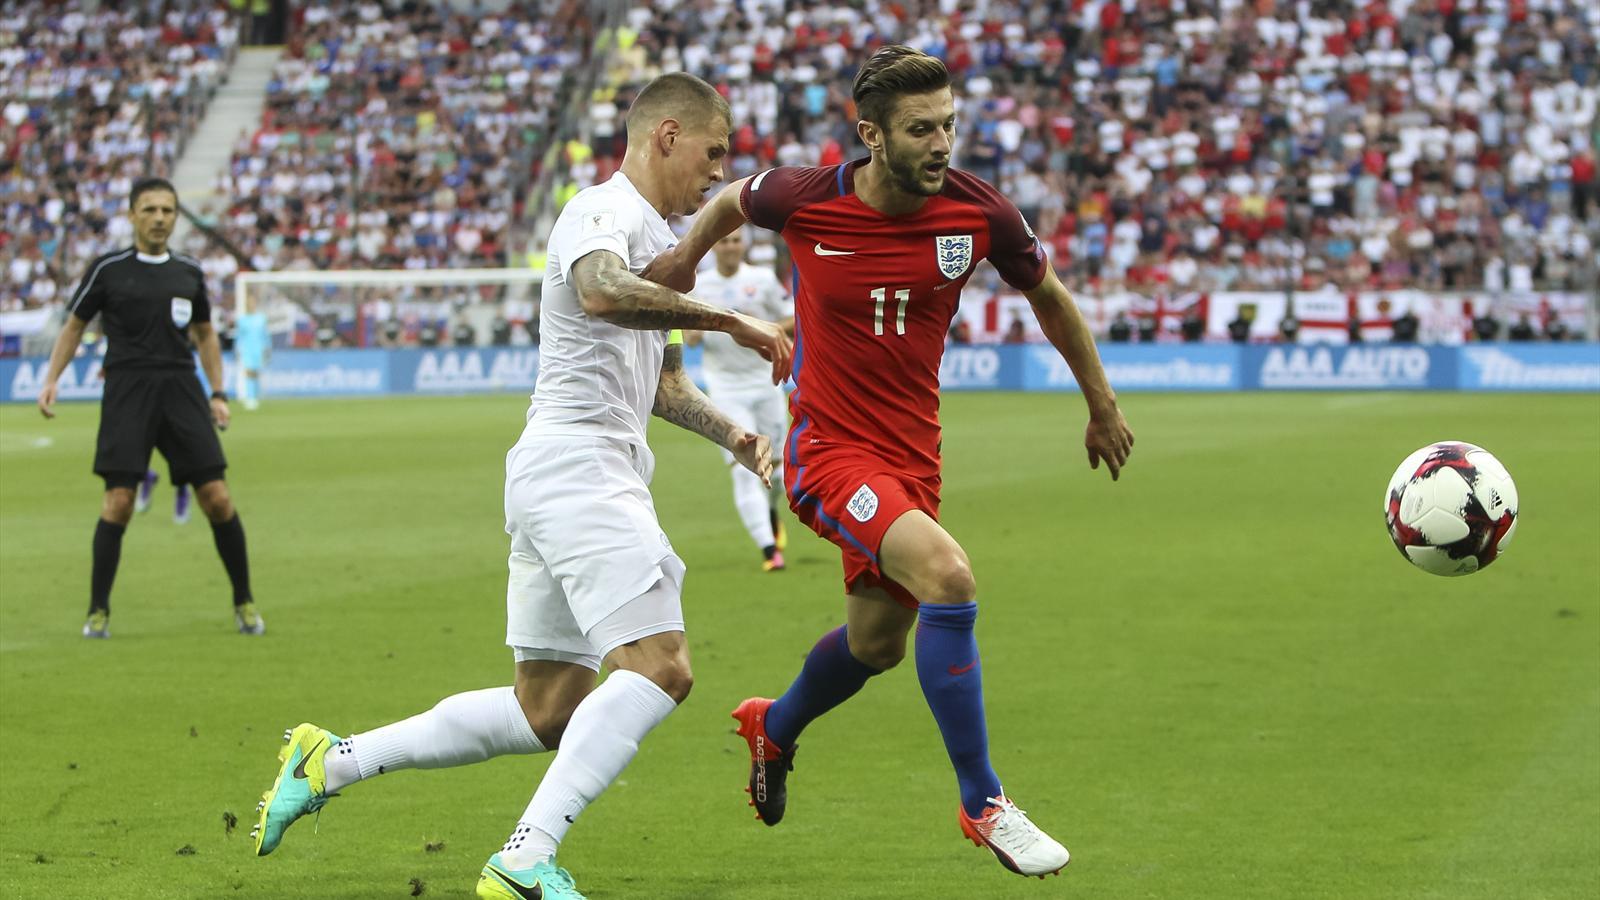 En direct live slovaquie angleterre qualif coupe du monde uefa 4 septembre 2016 - Calendrier coupe d angleterre ...